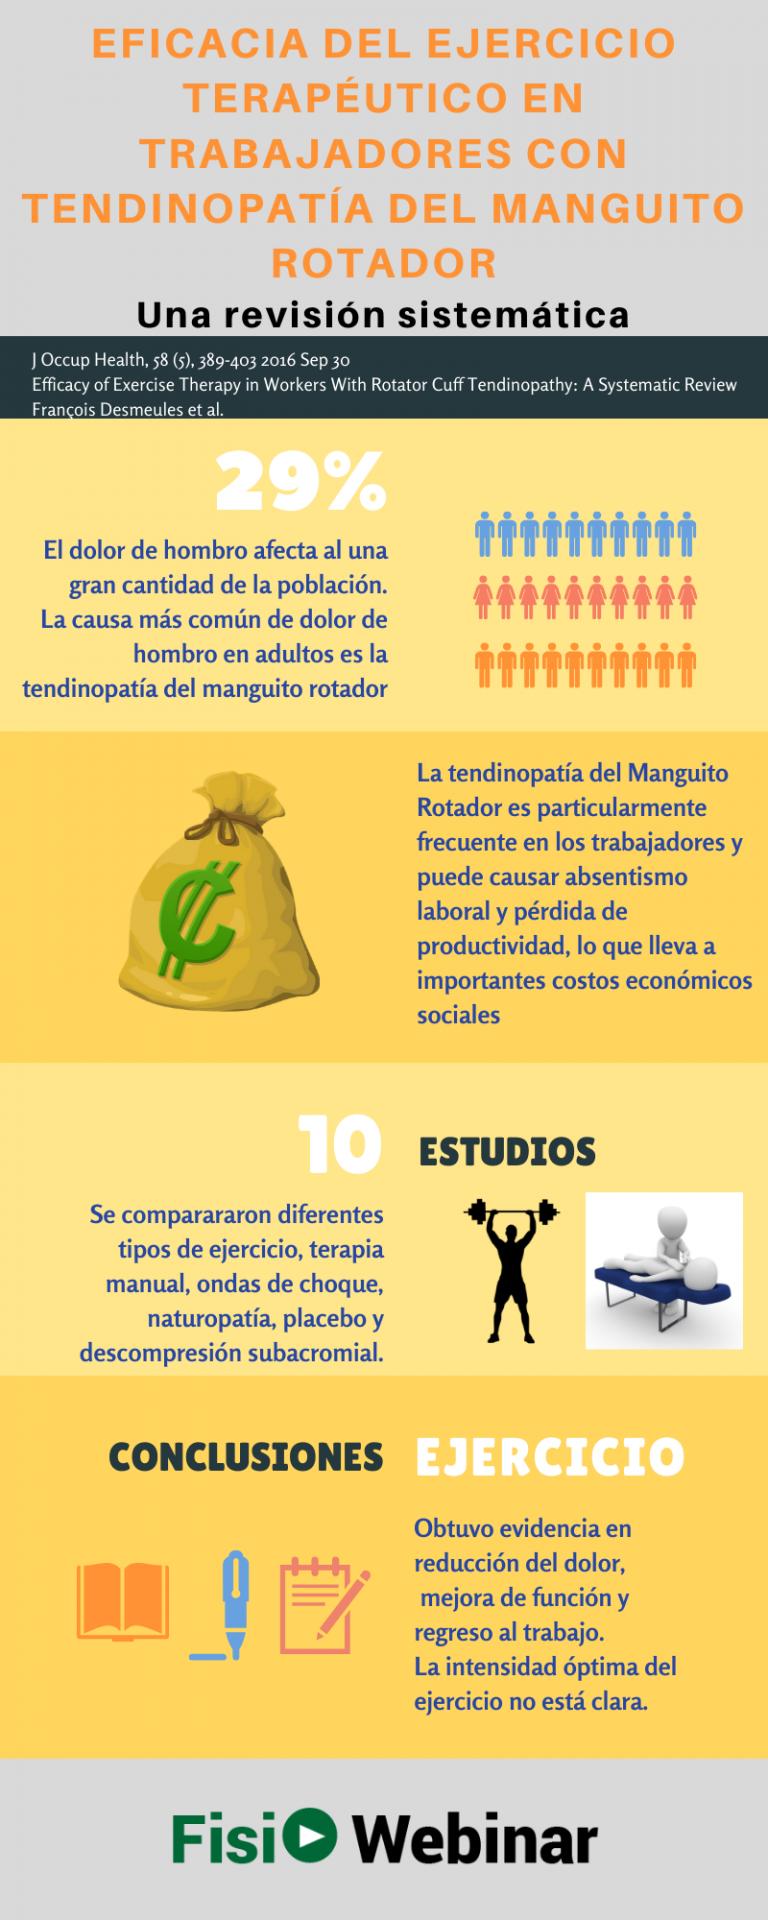 TENDINOPATÍA MANGUITO ROTADOR